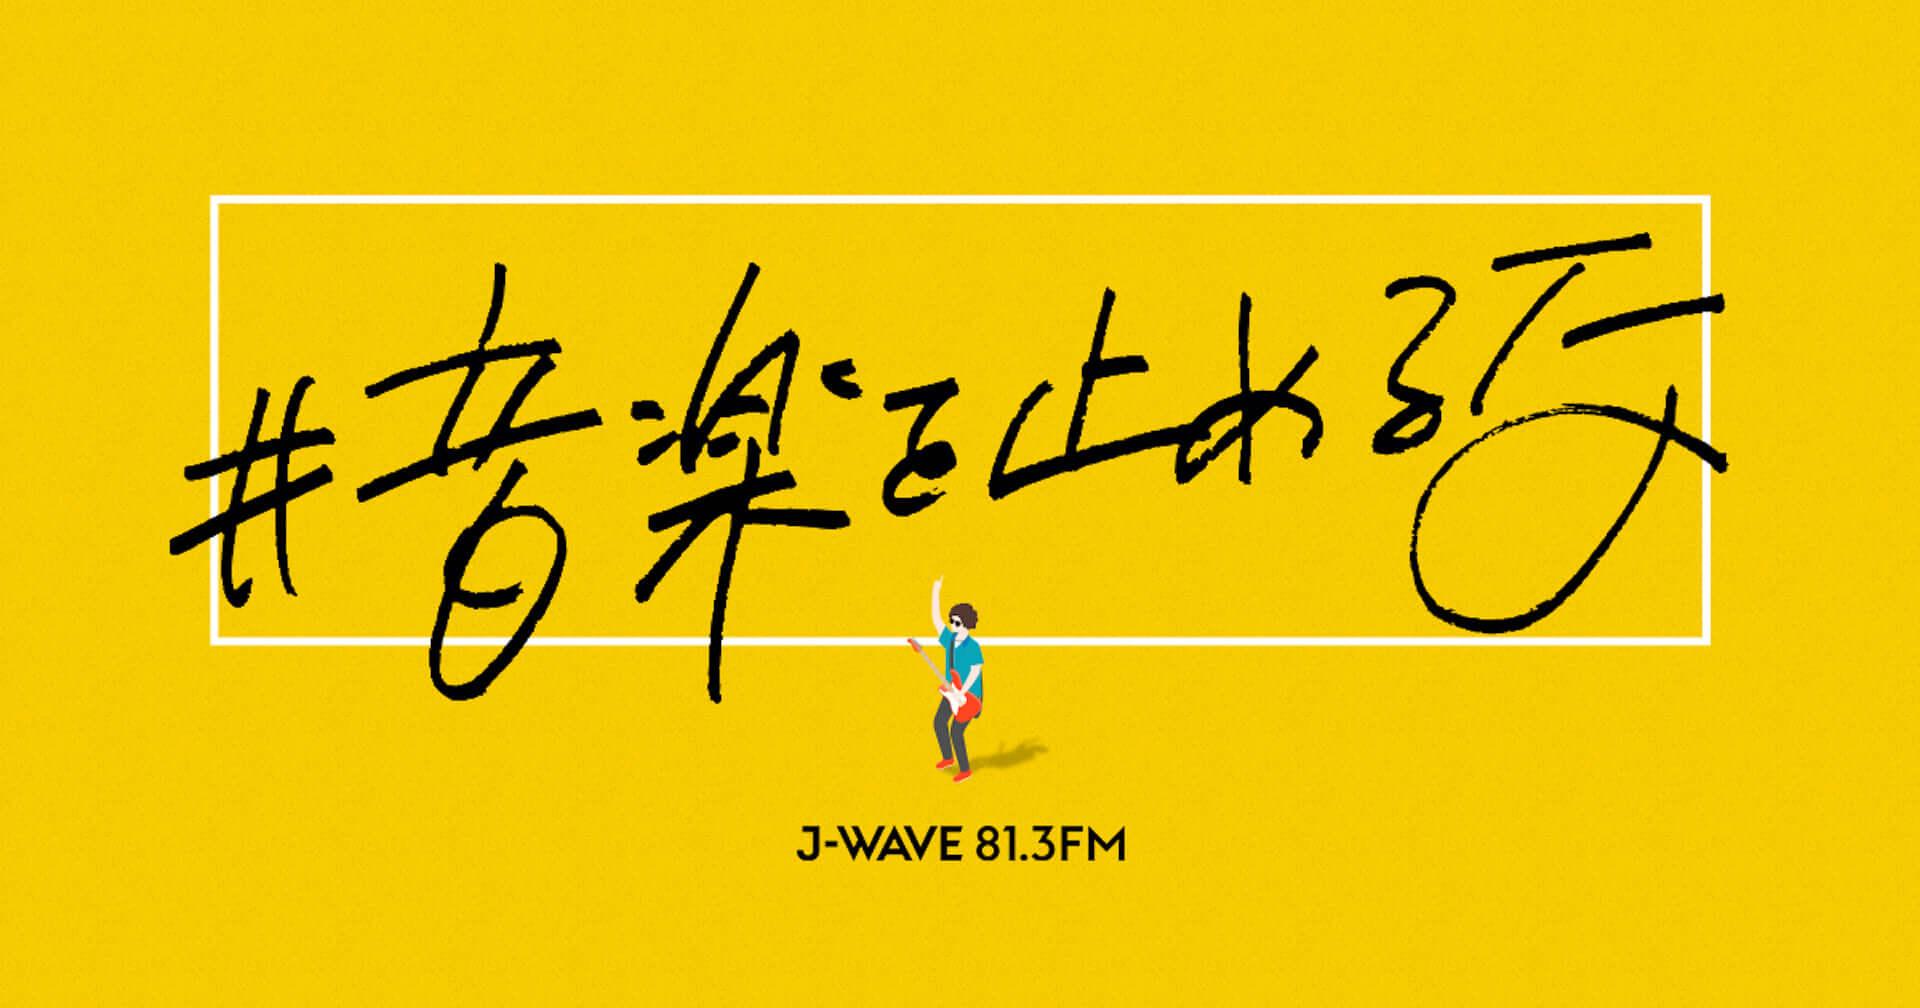 J-WAVE「#音楽を止めるな」プロジェクトが始動|04 Limited Sazabysとあっこゴリラの生ライブ放送が決定 music200401_jwave_live_5-1920x1008